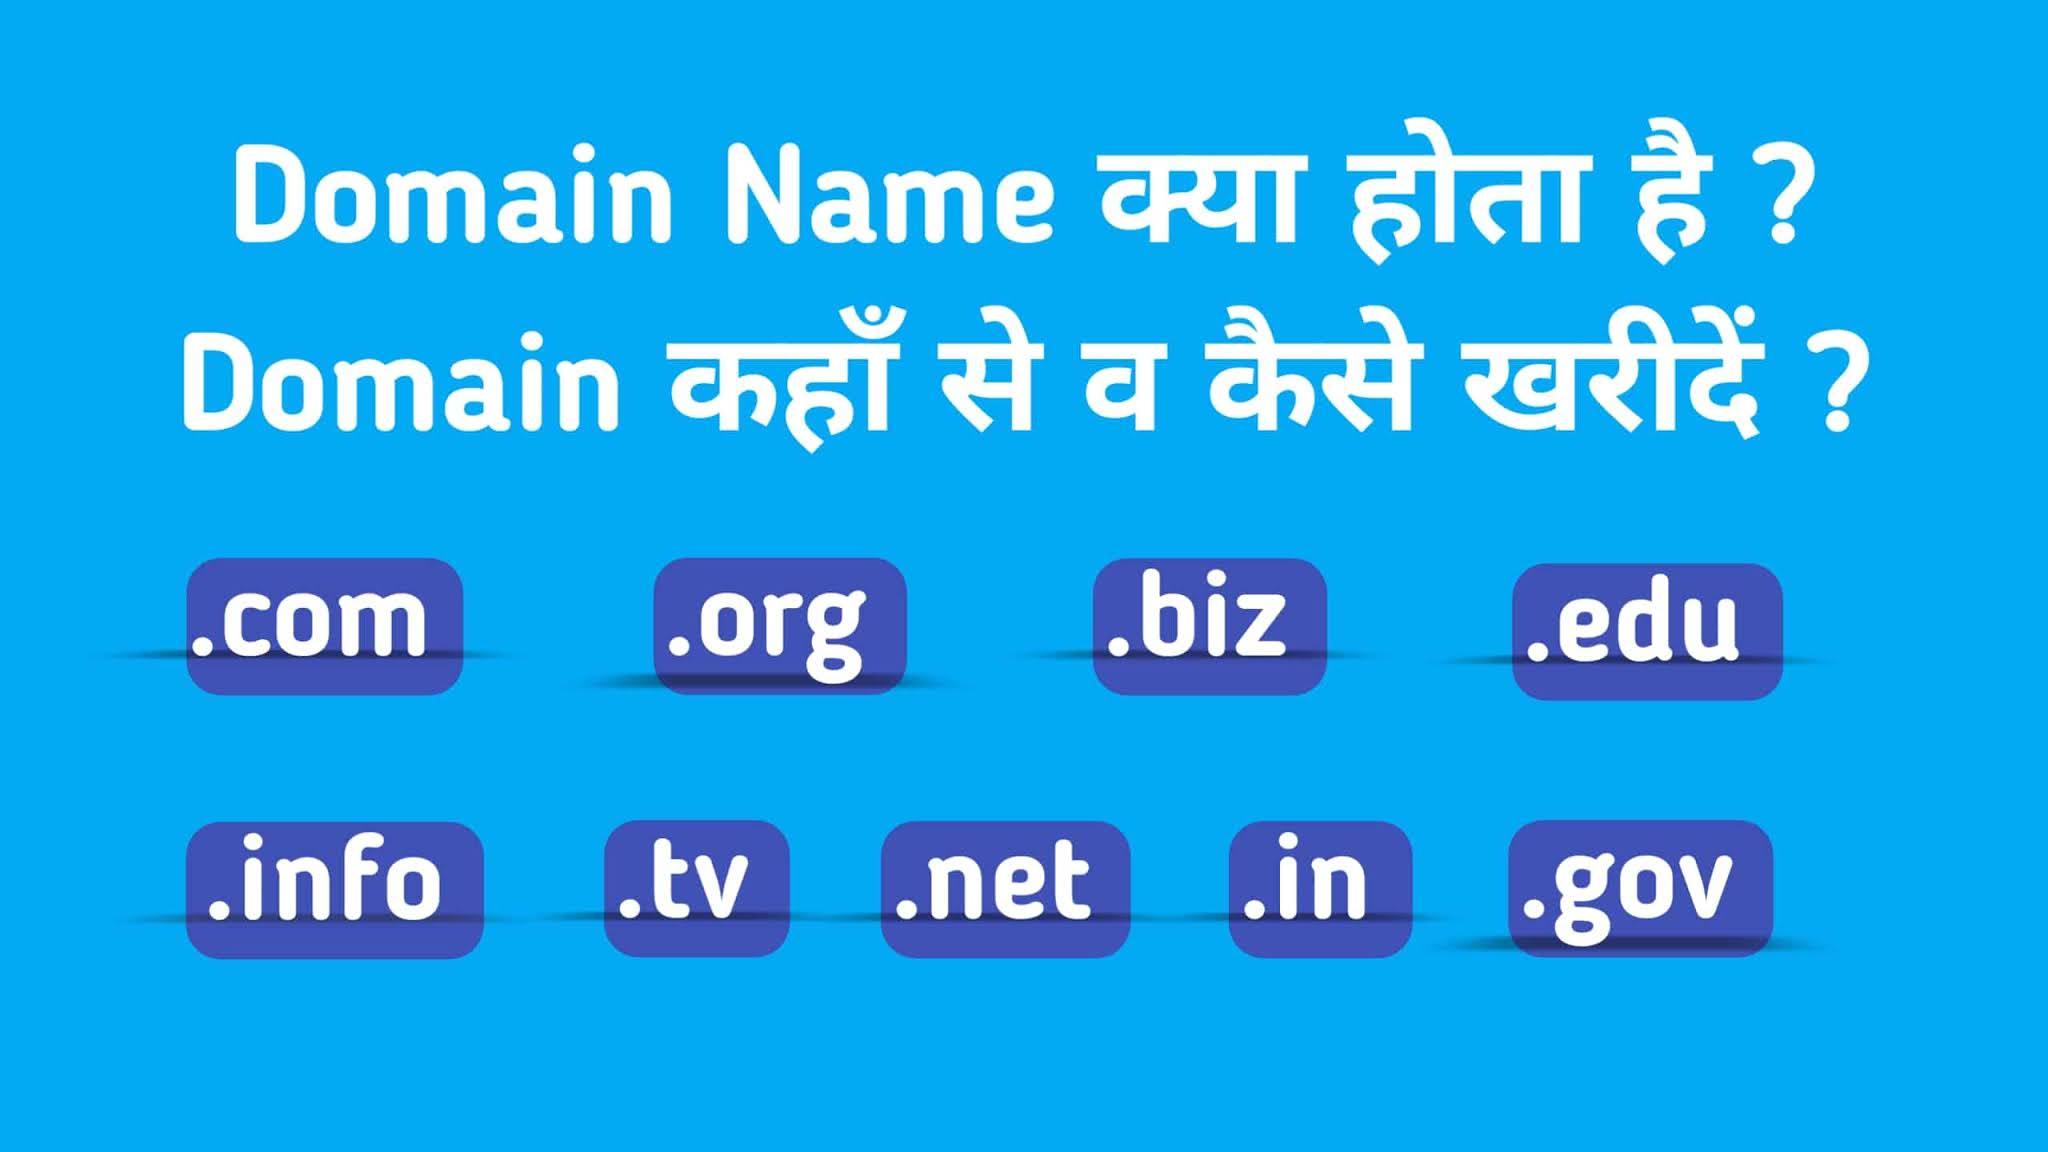 Domain Name kya hai - HindiCraze